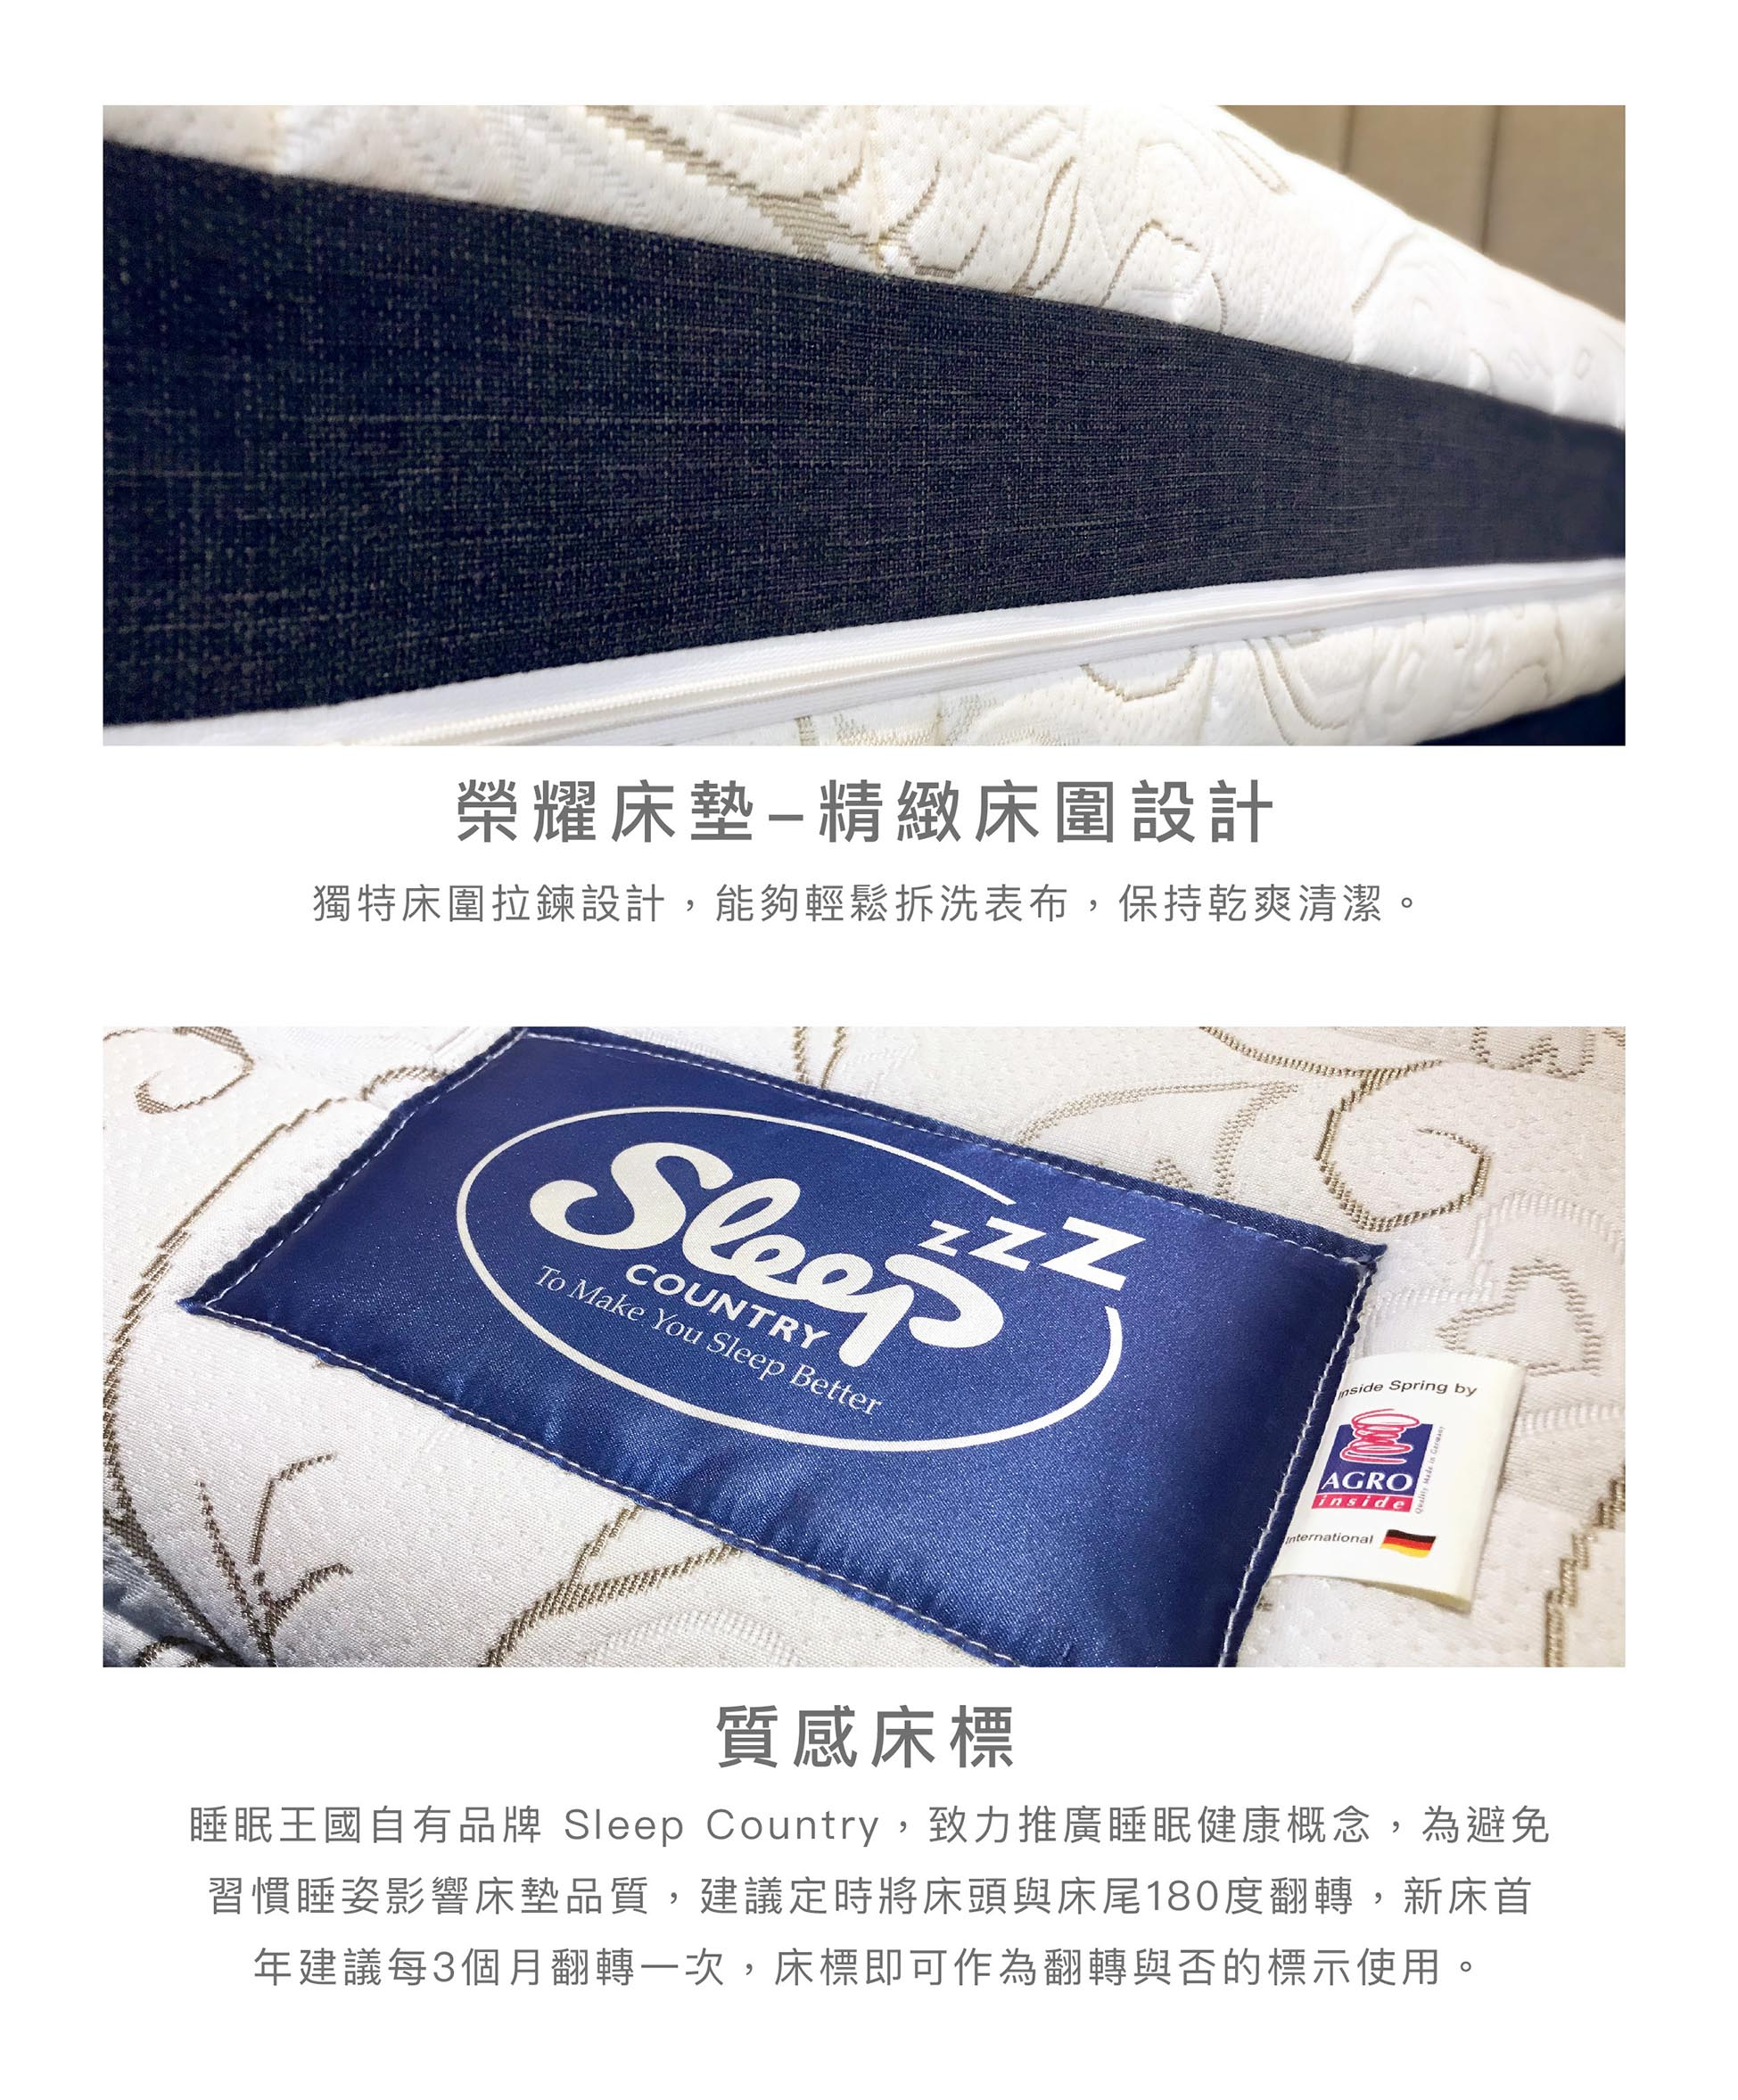 Sleep Country 智能調整床|SMART-702|睡眠王國集團